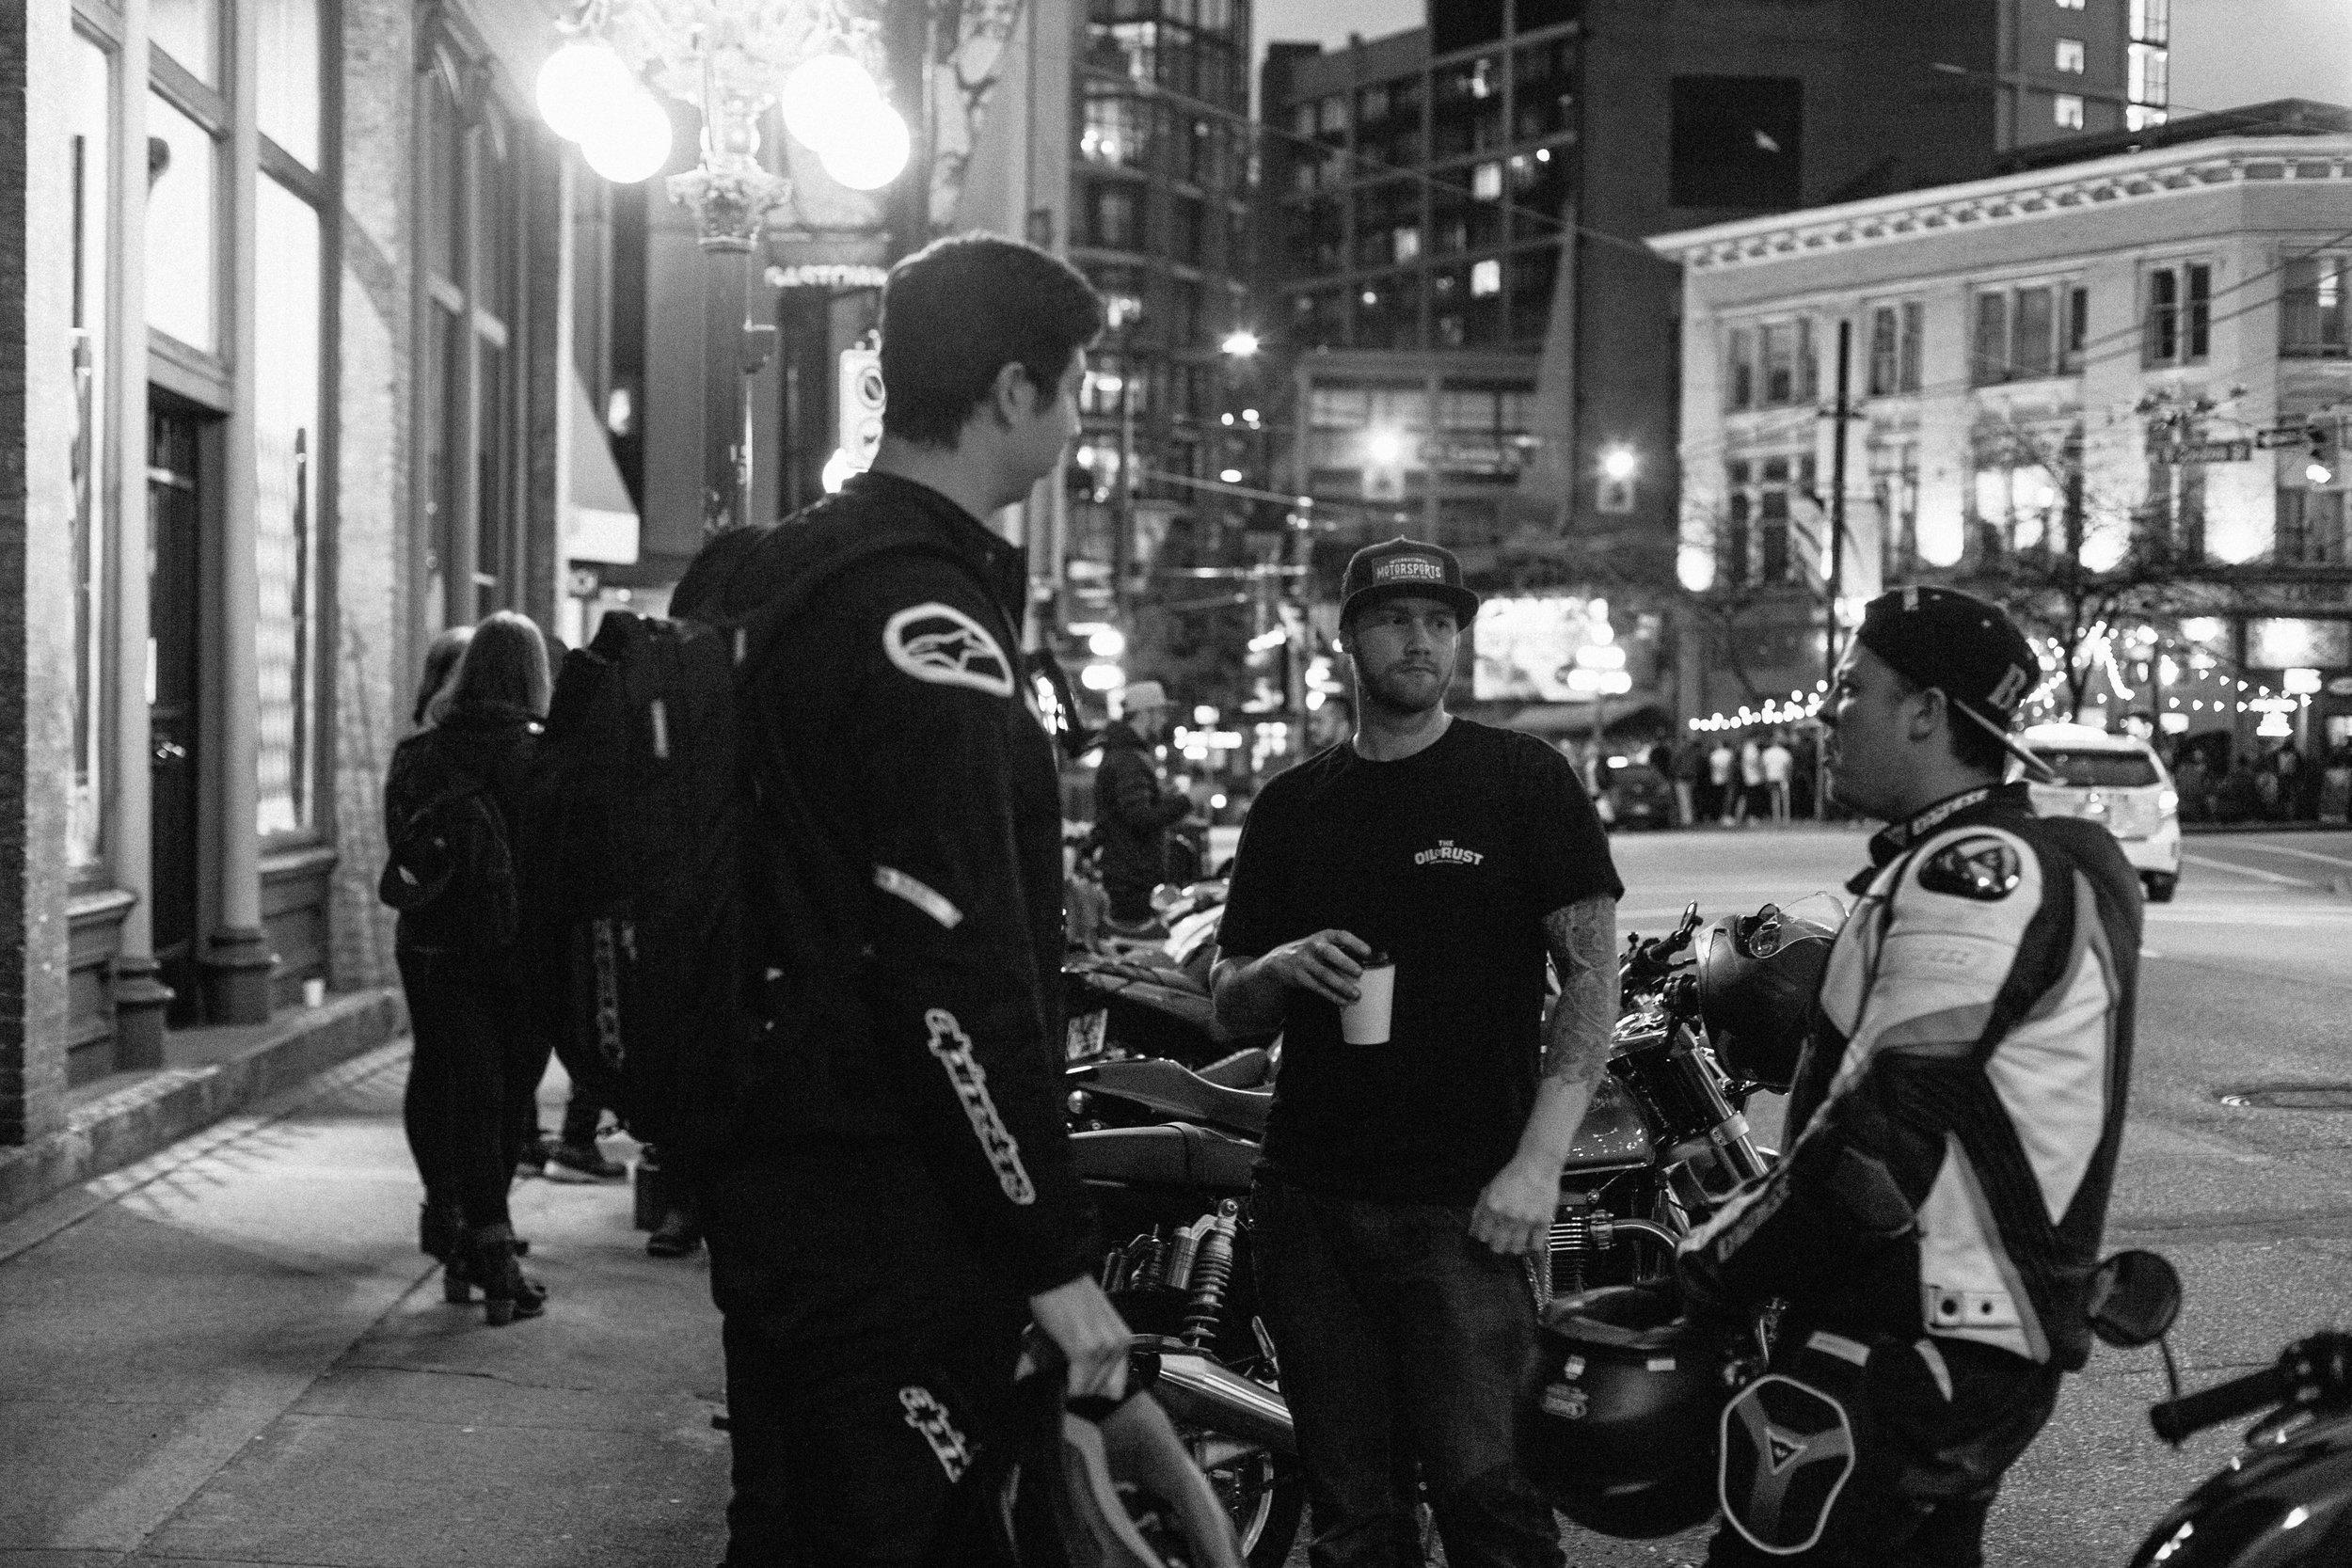 Viktor Radics_#TheMotoSocialVANCOUVER_May 9_2017_TimbertrainCoffeeRoastersIMG_6465_FULLRes.jpg